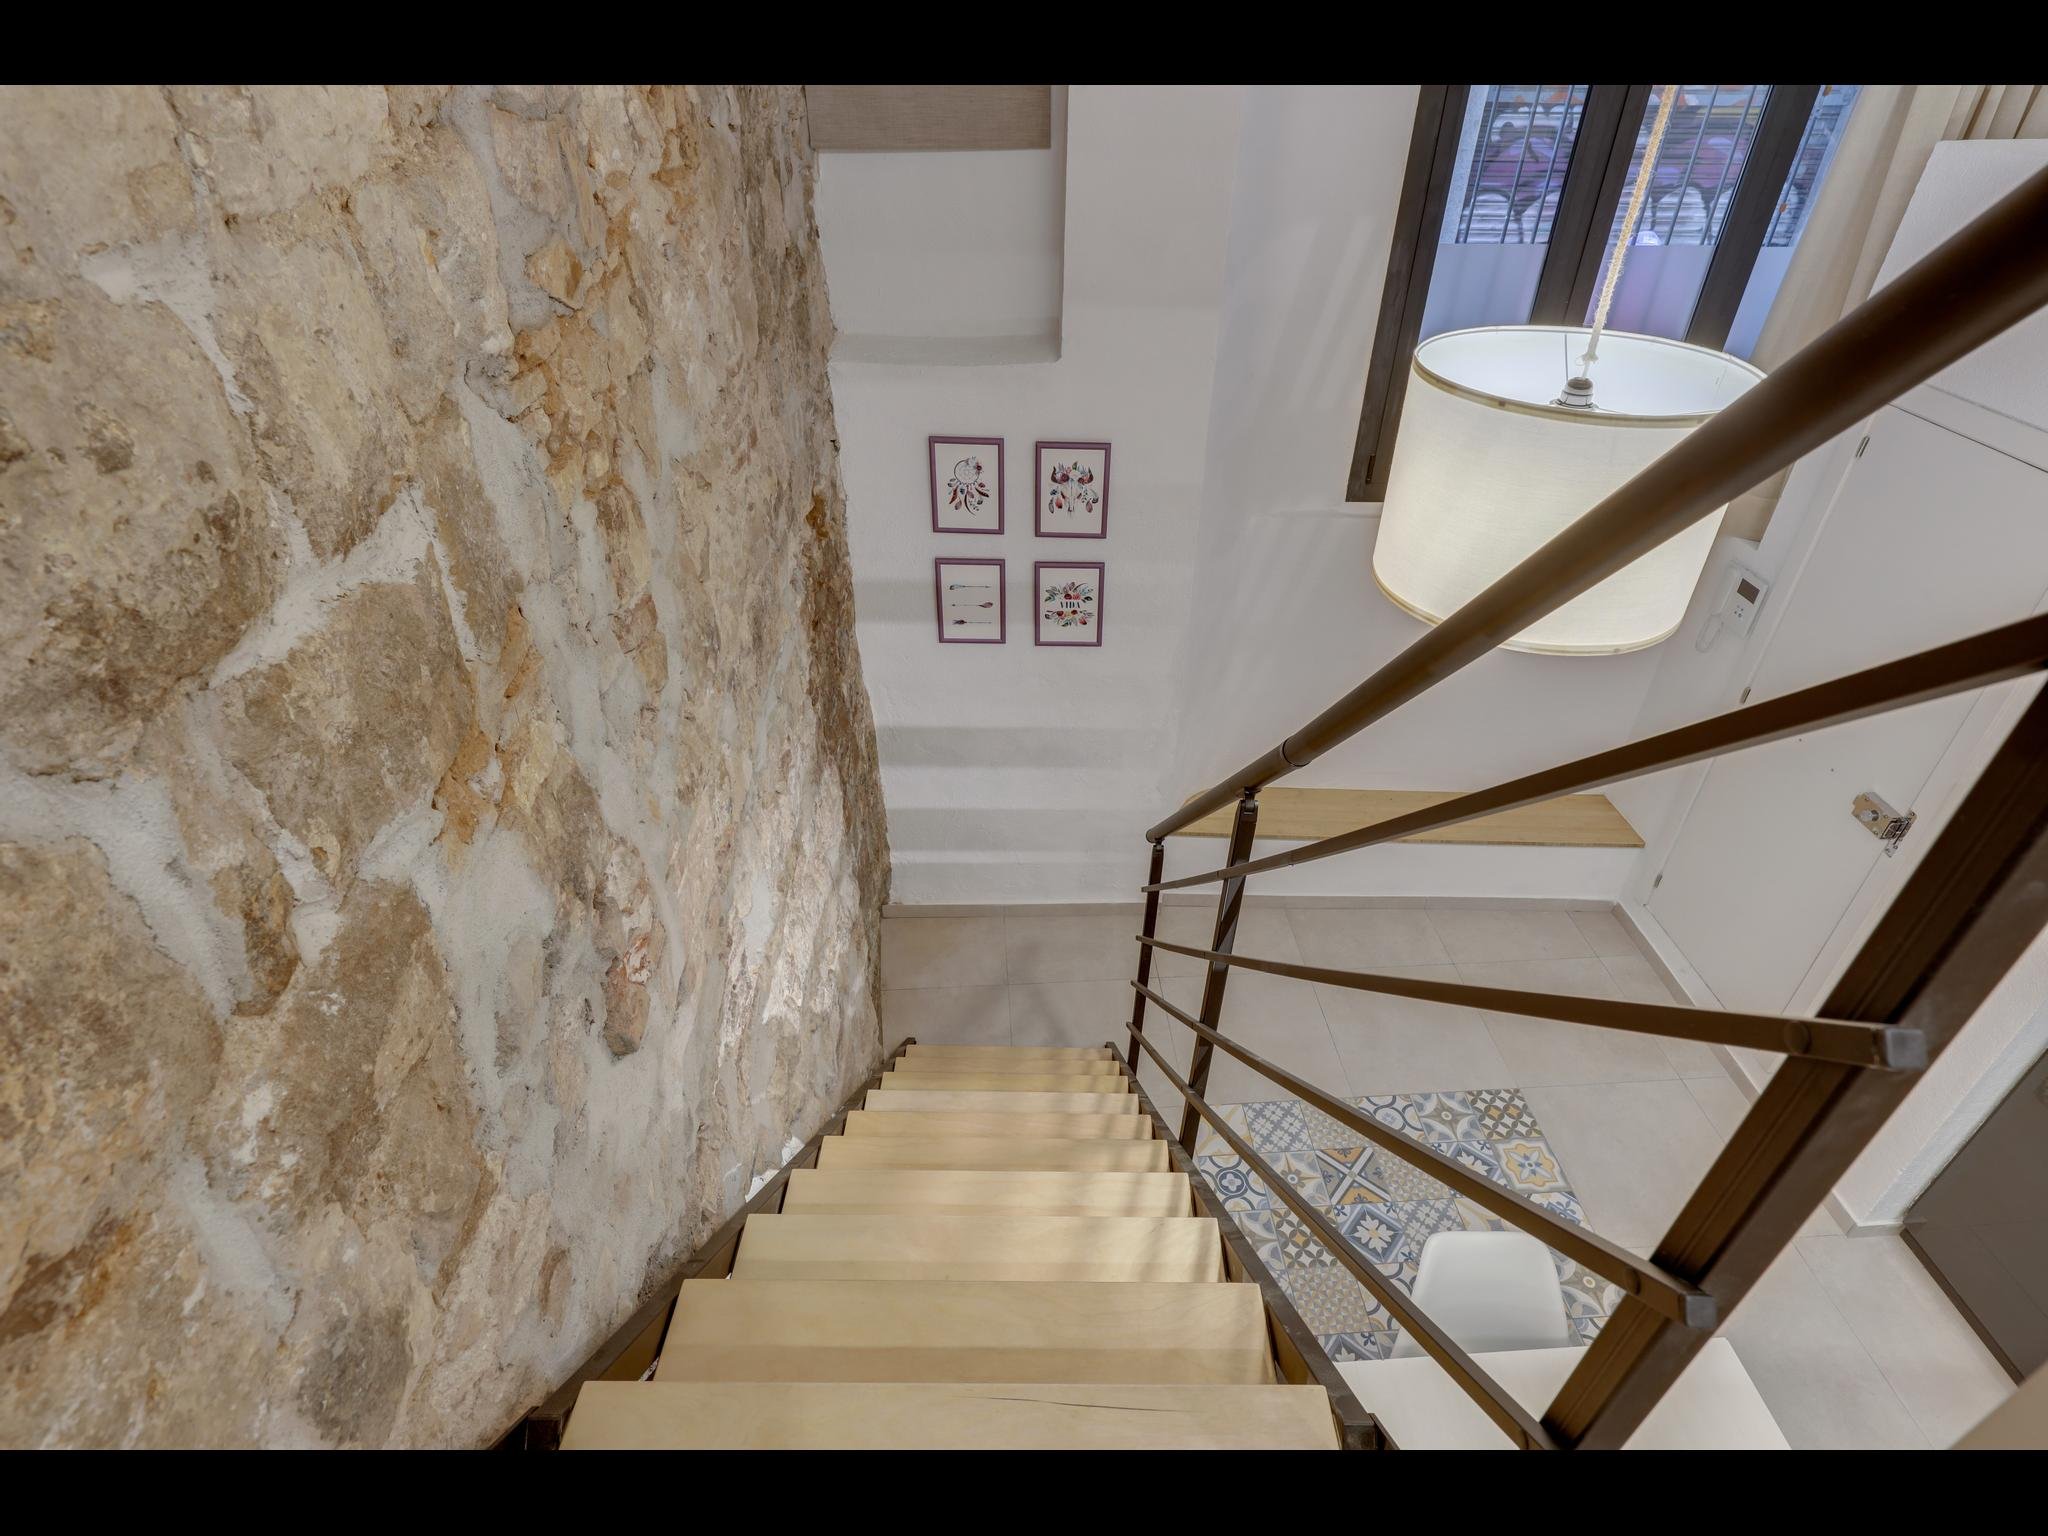 Sant Cugat 2 - Estudio de lujo Barcelona